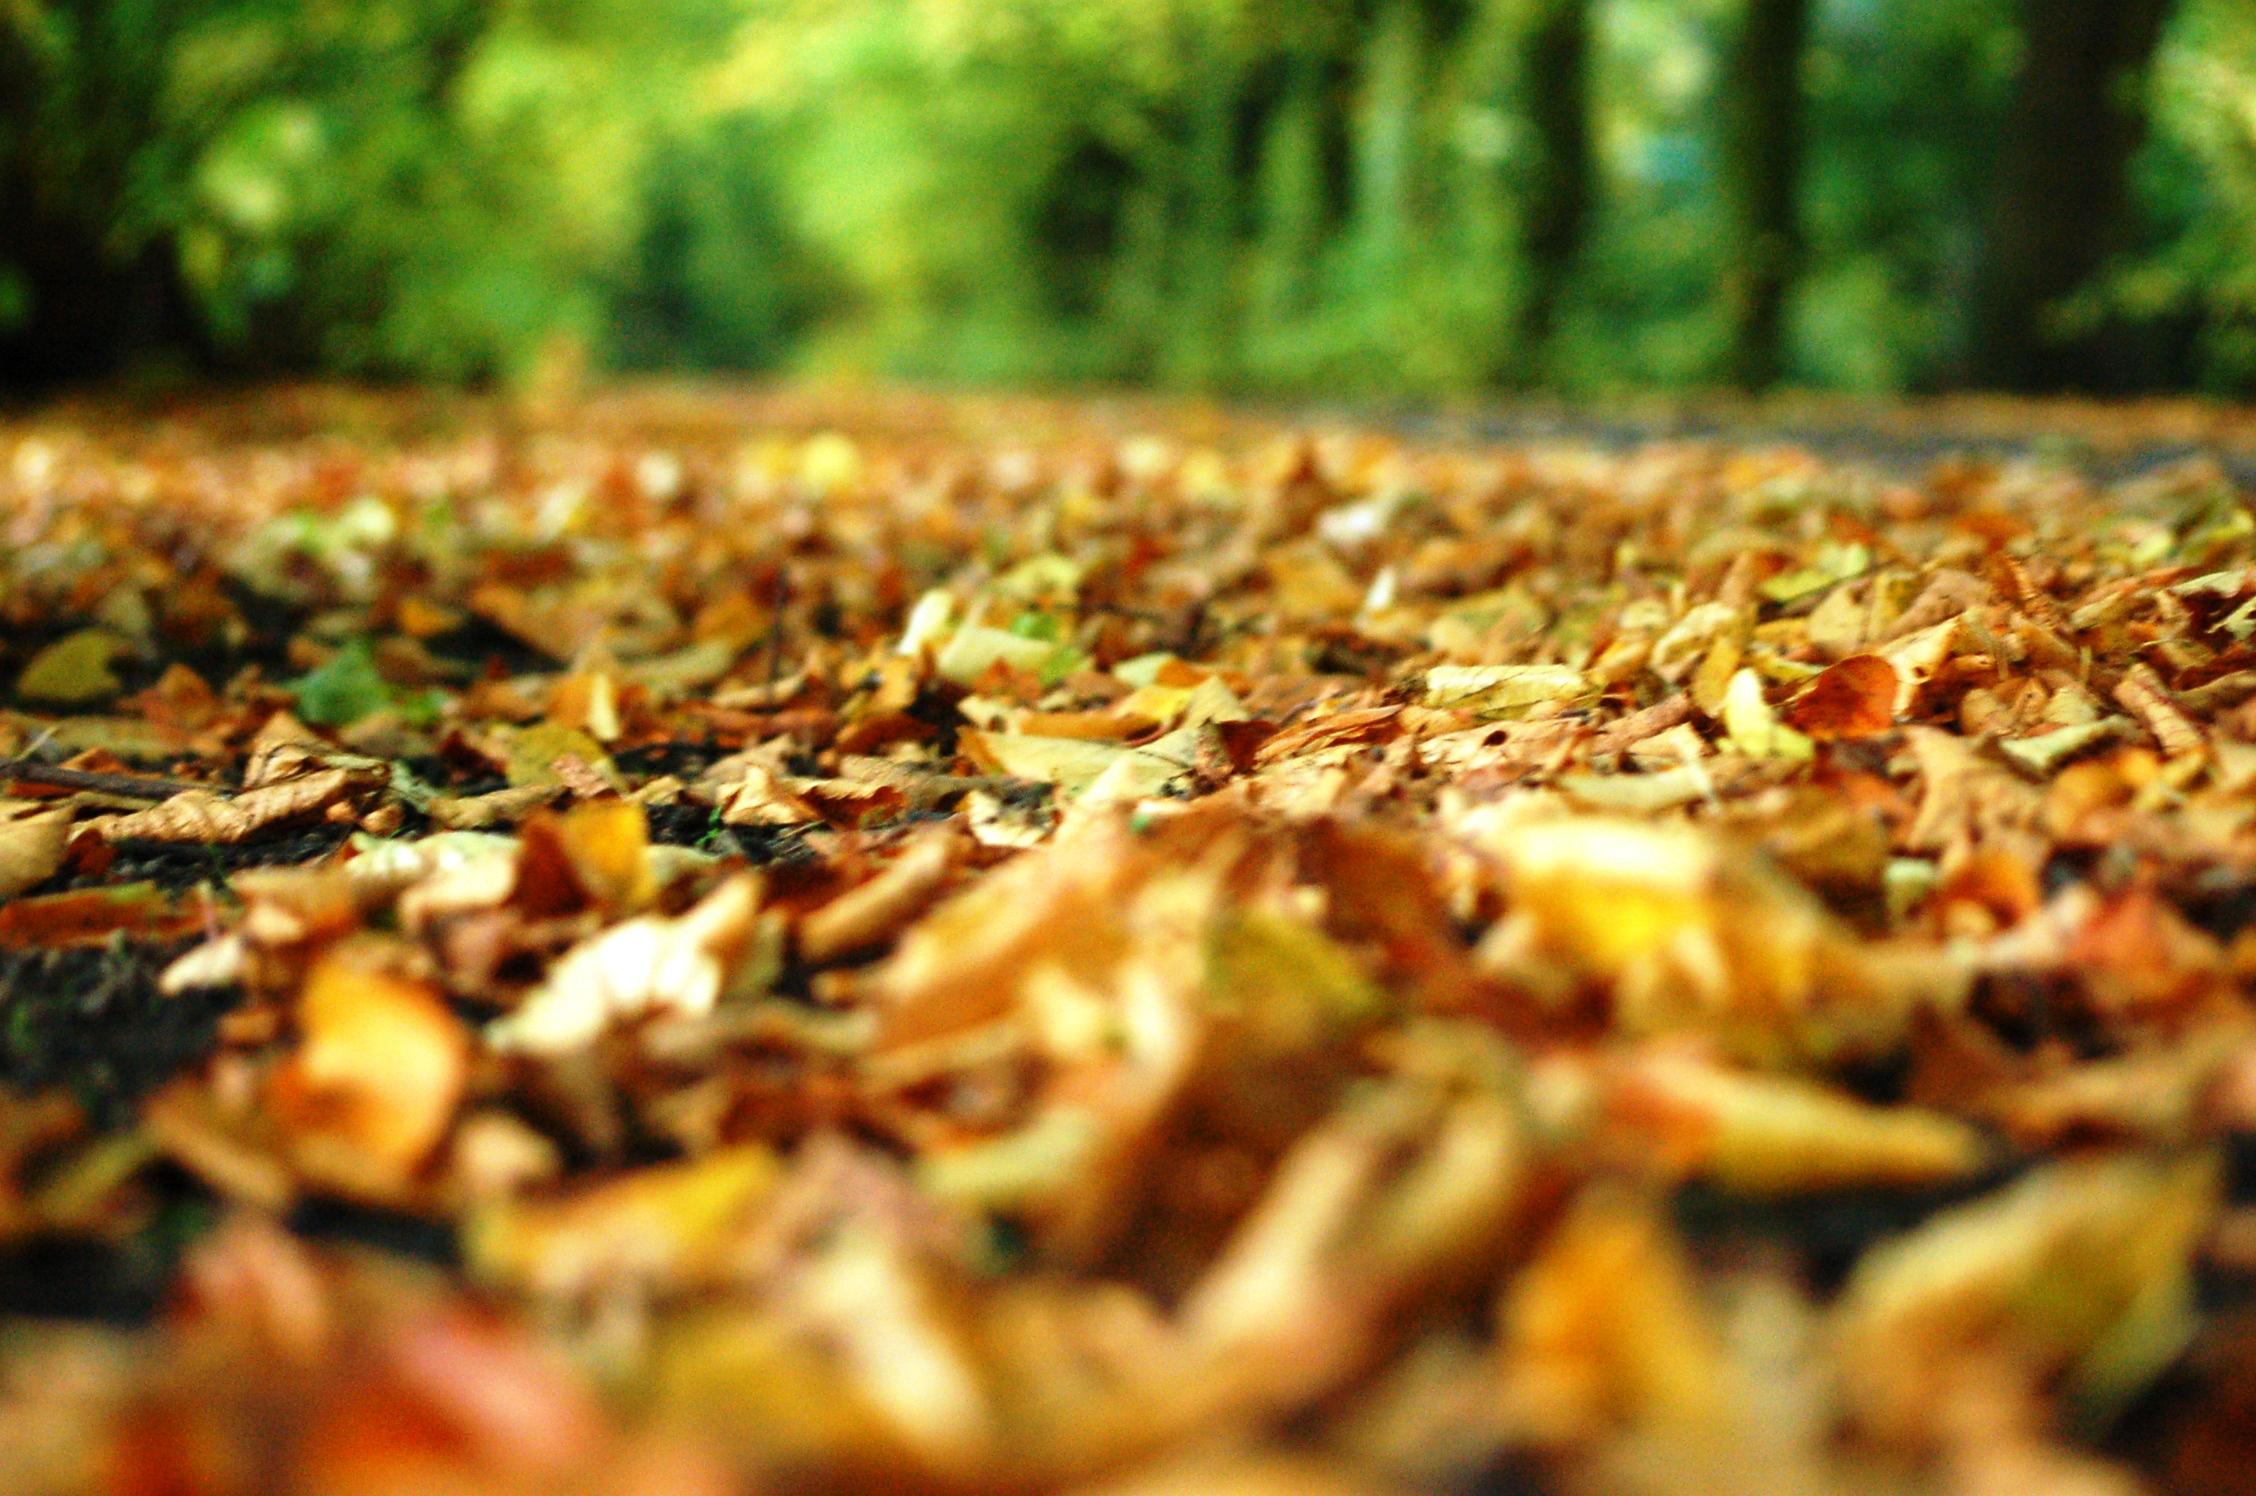 Leaf Nature Fall 2256x1496